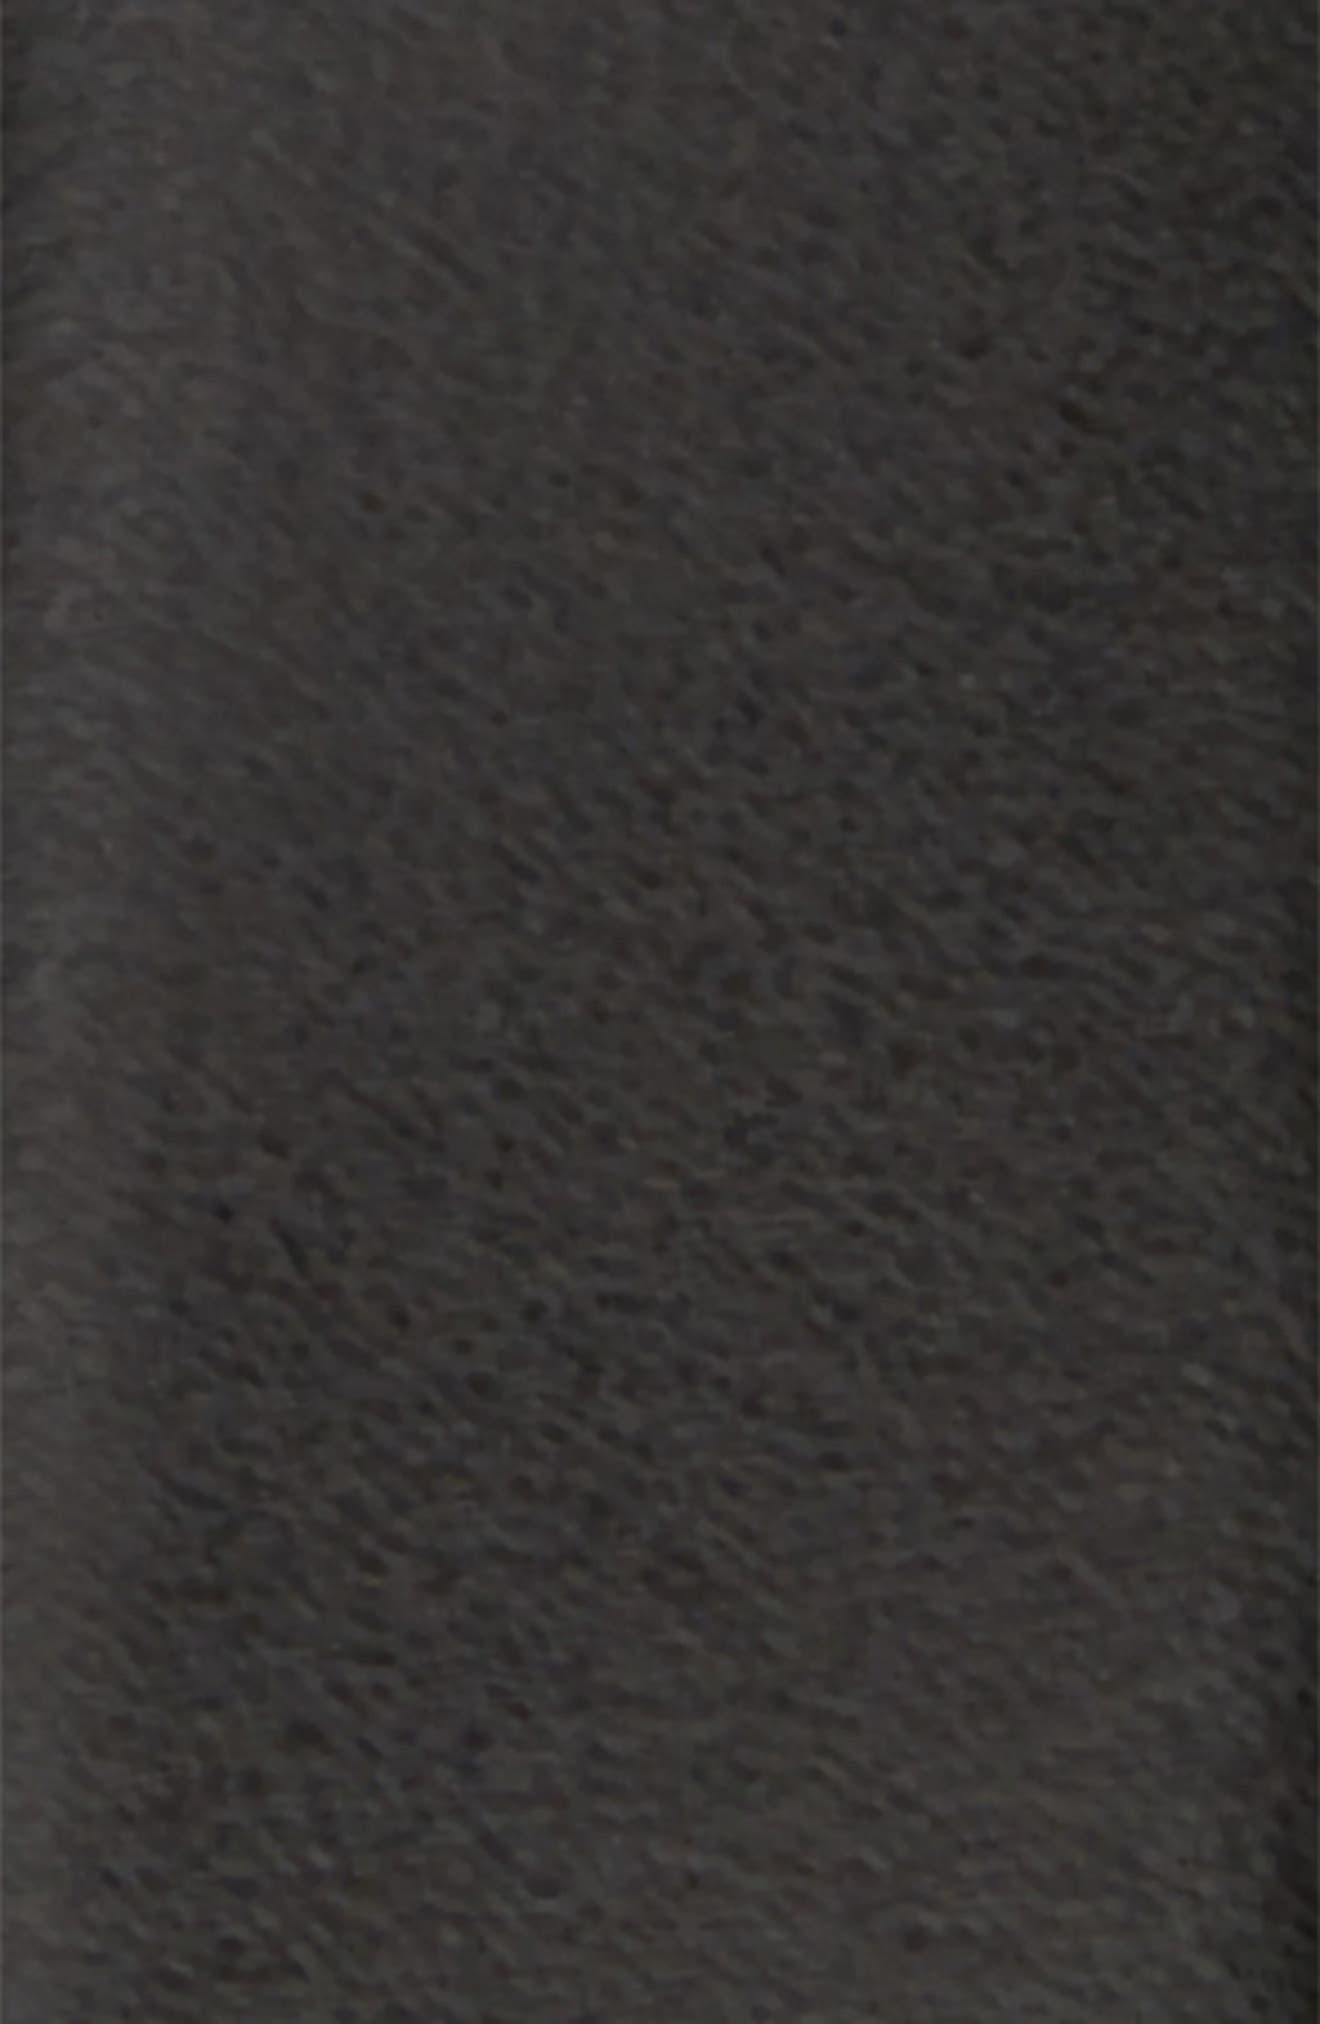 Horseshoe Buckle Reversible Leather Belt,                             Alternate thumbnail 3, color,                             Black/ Brown